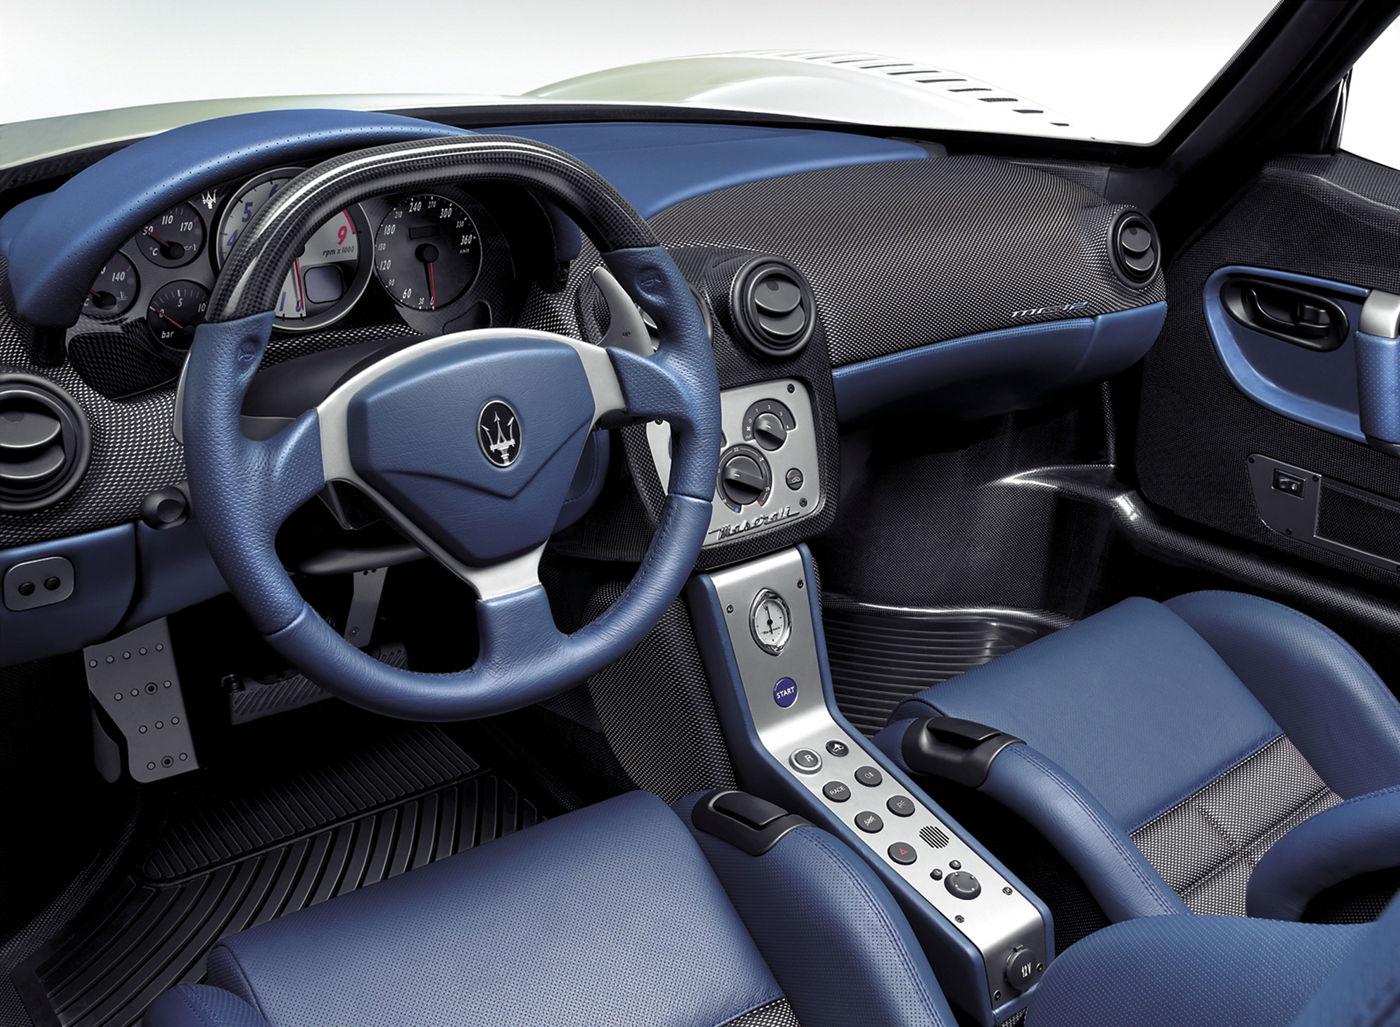 2004 Maserati MC12 Stradale (road-going) - the GT racing car interior